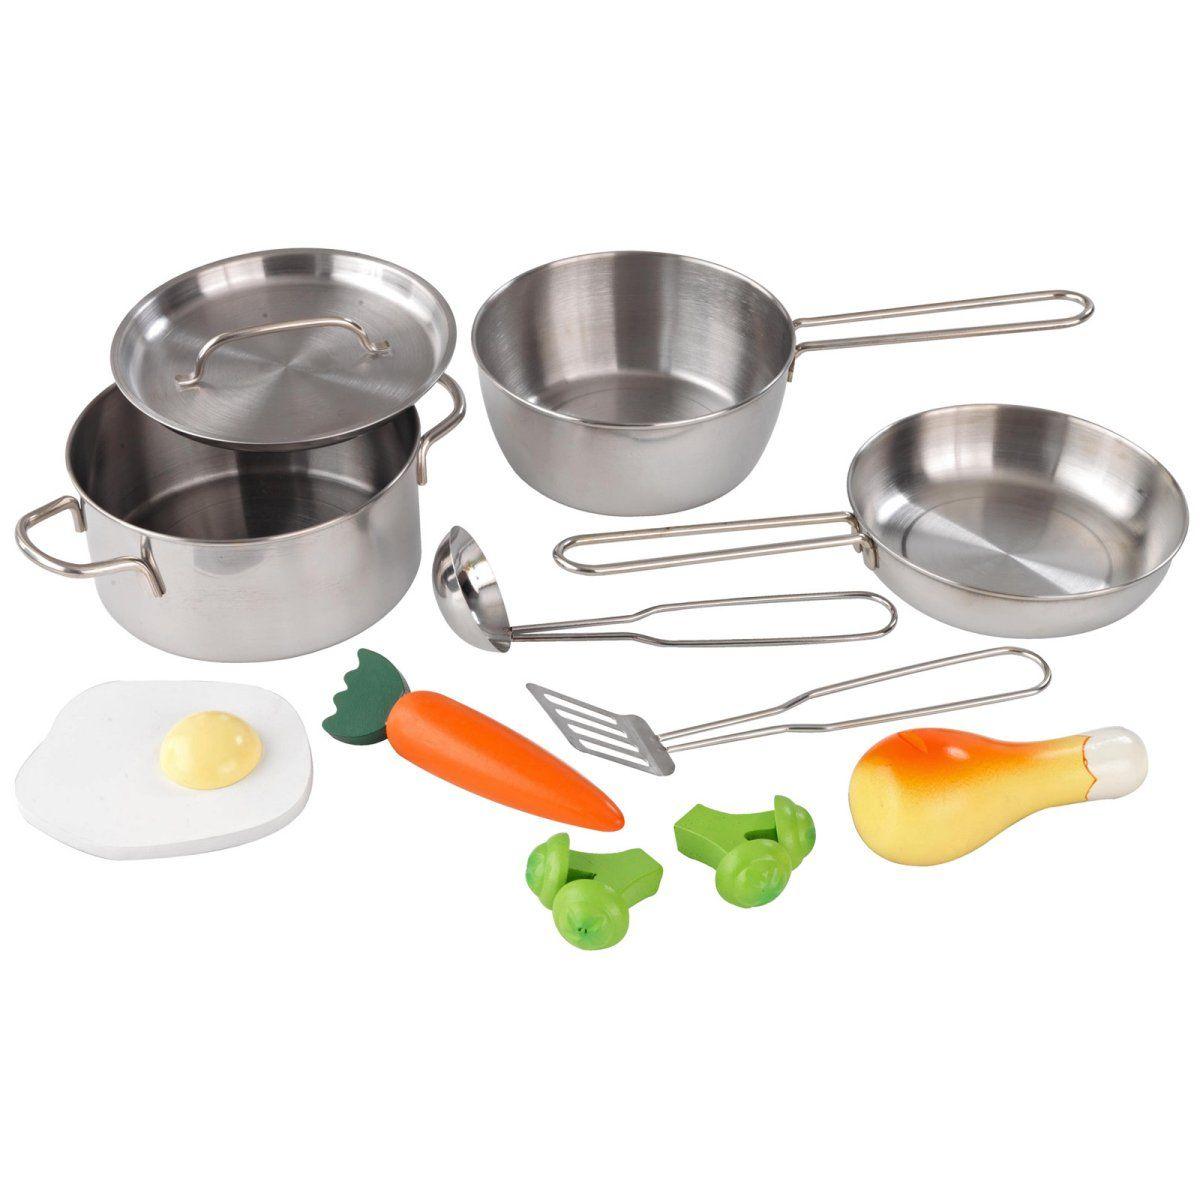 kidkraft metal accessories set | play kitchen accessories